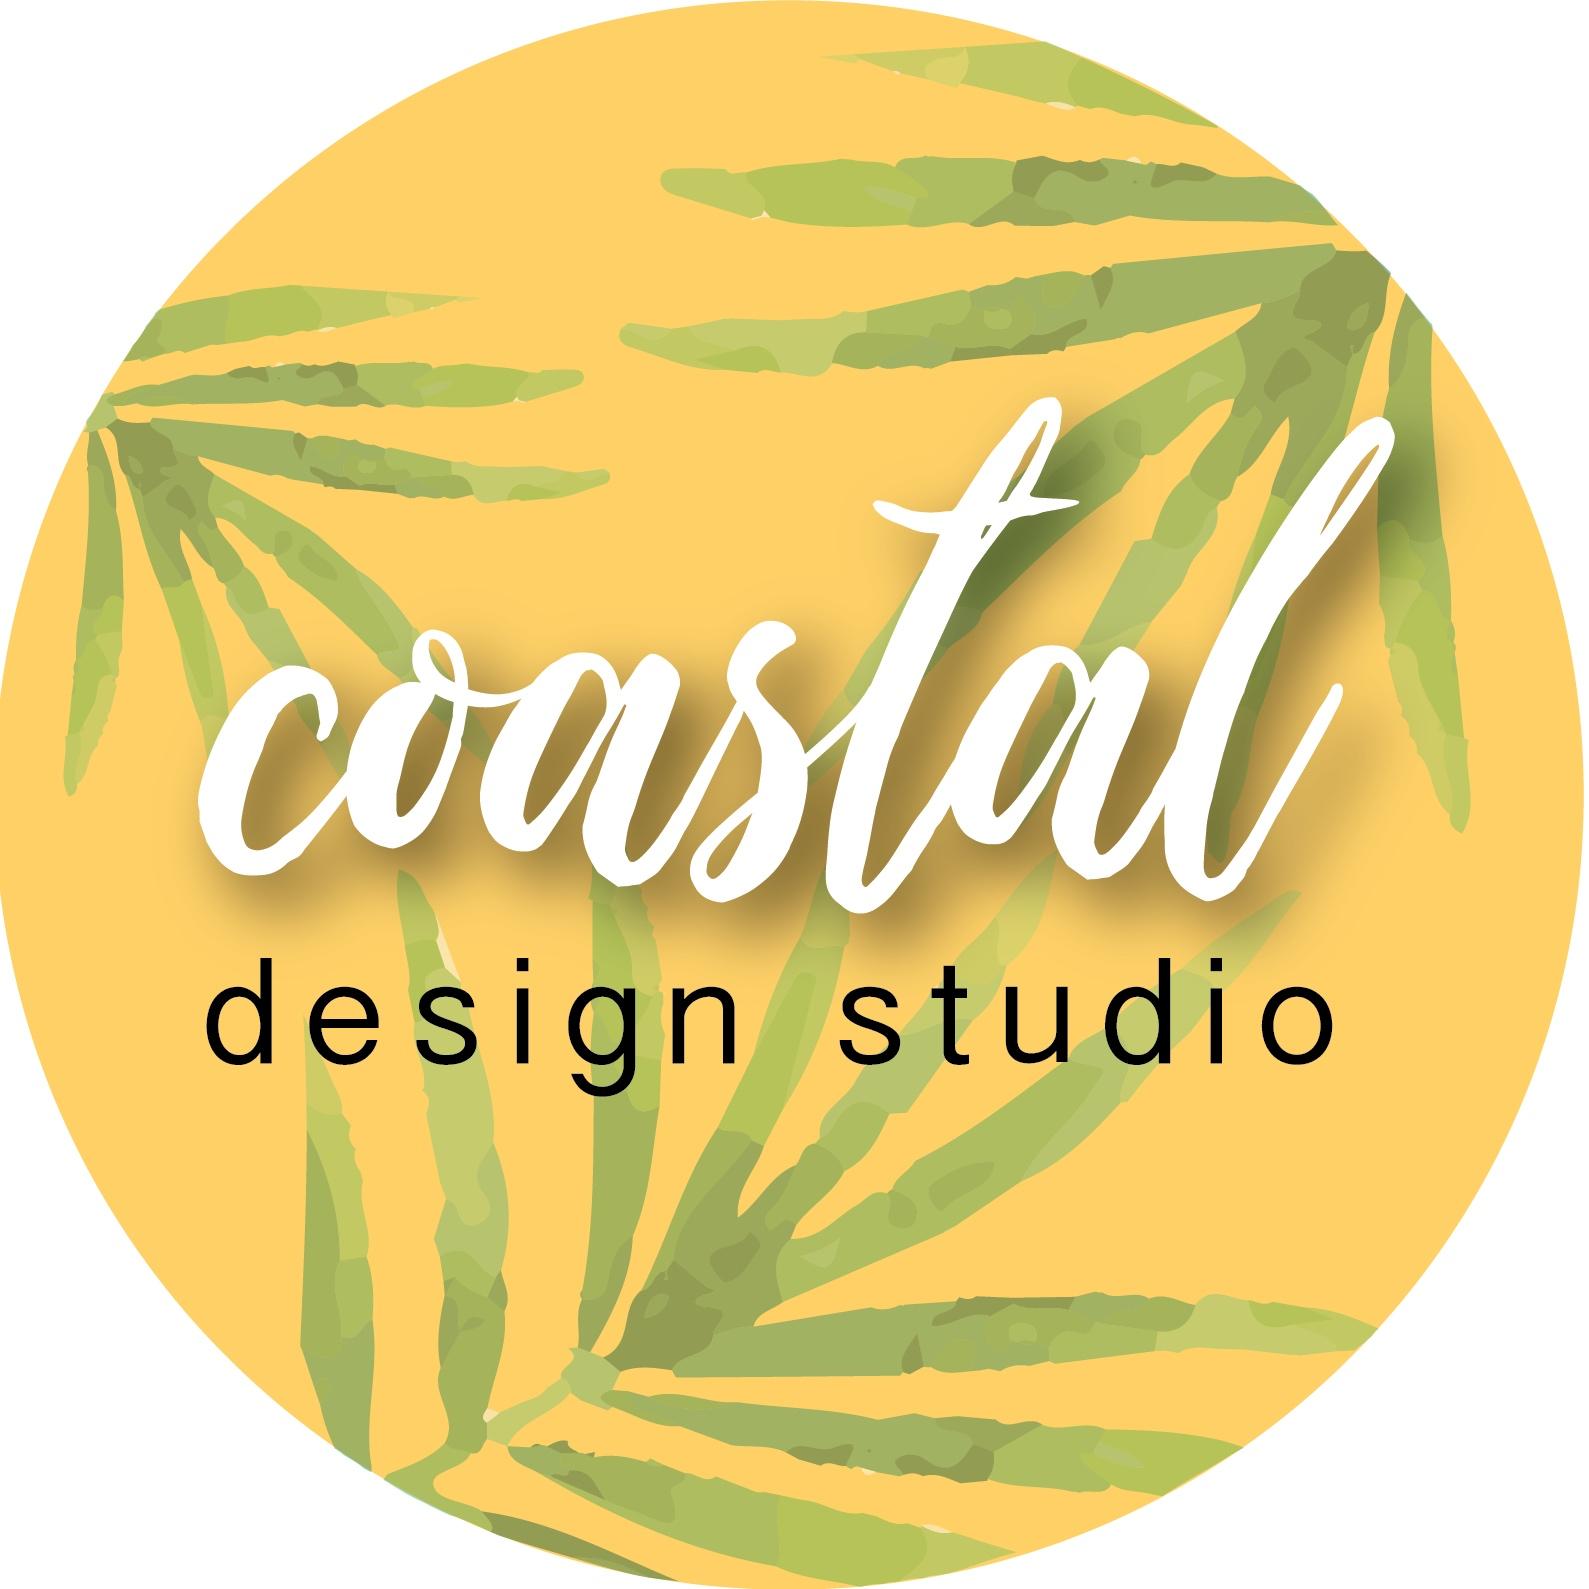 Coastal Designs Studio